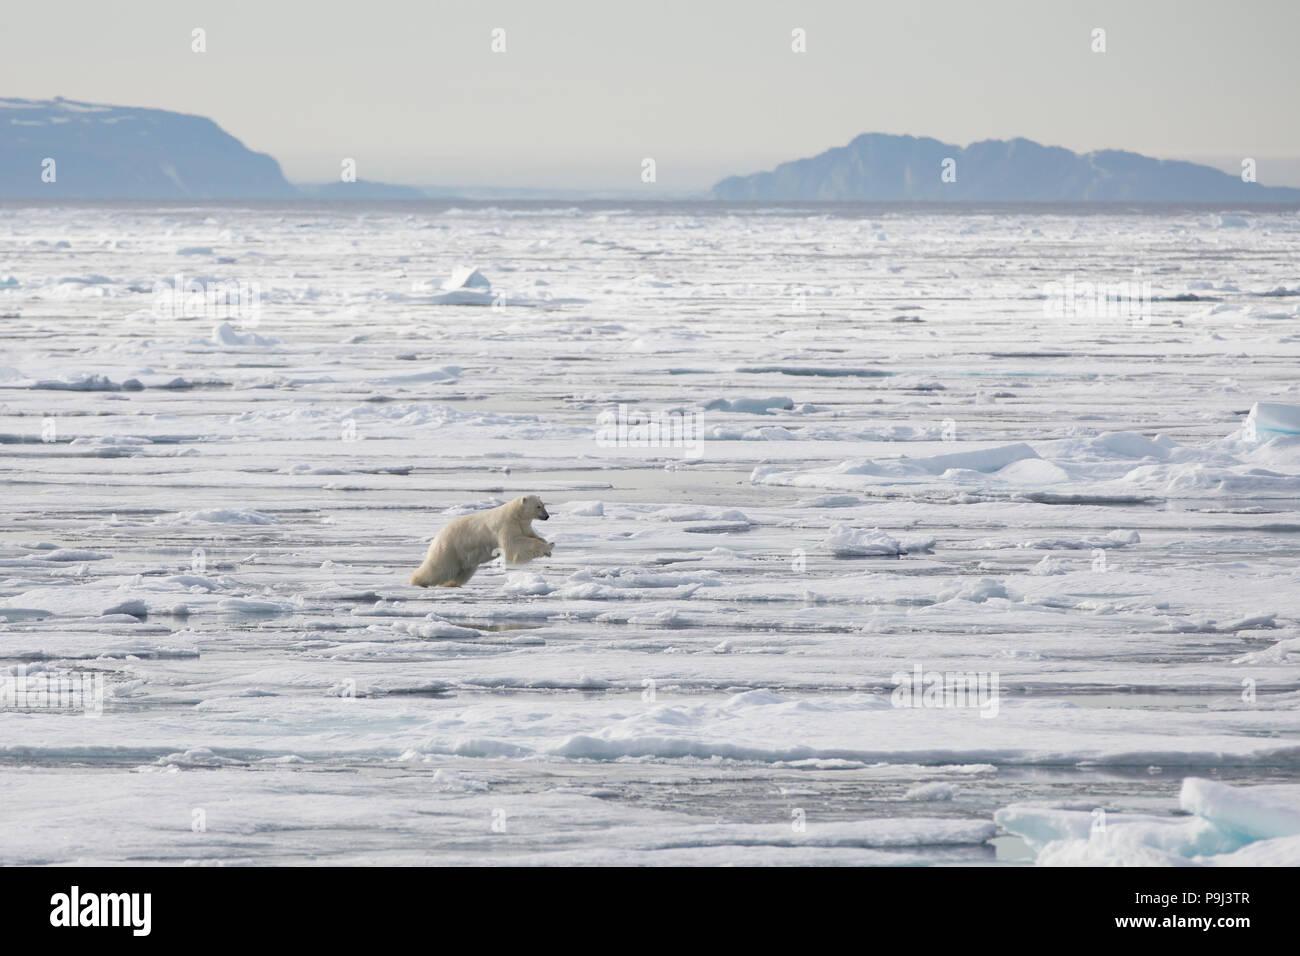 Large Polar Bear jumping across sea ice near Svalbard - Stock Image